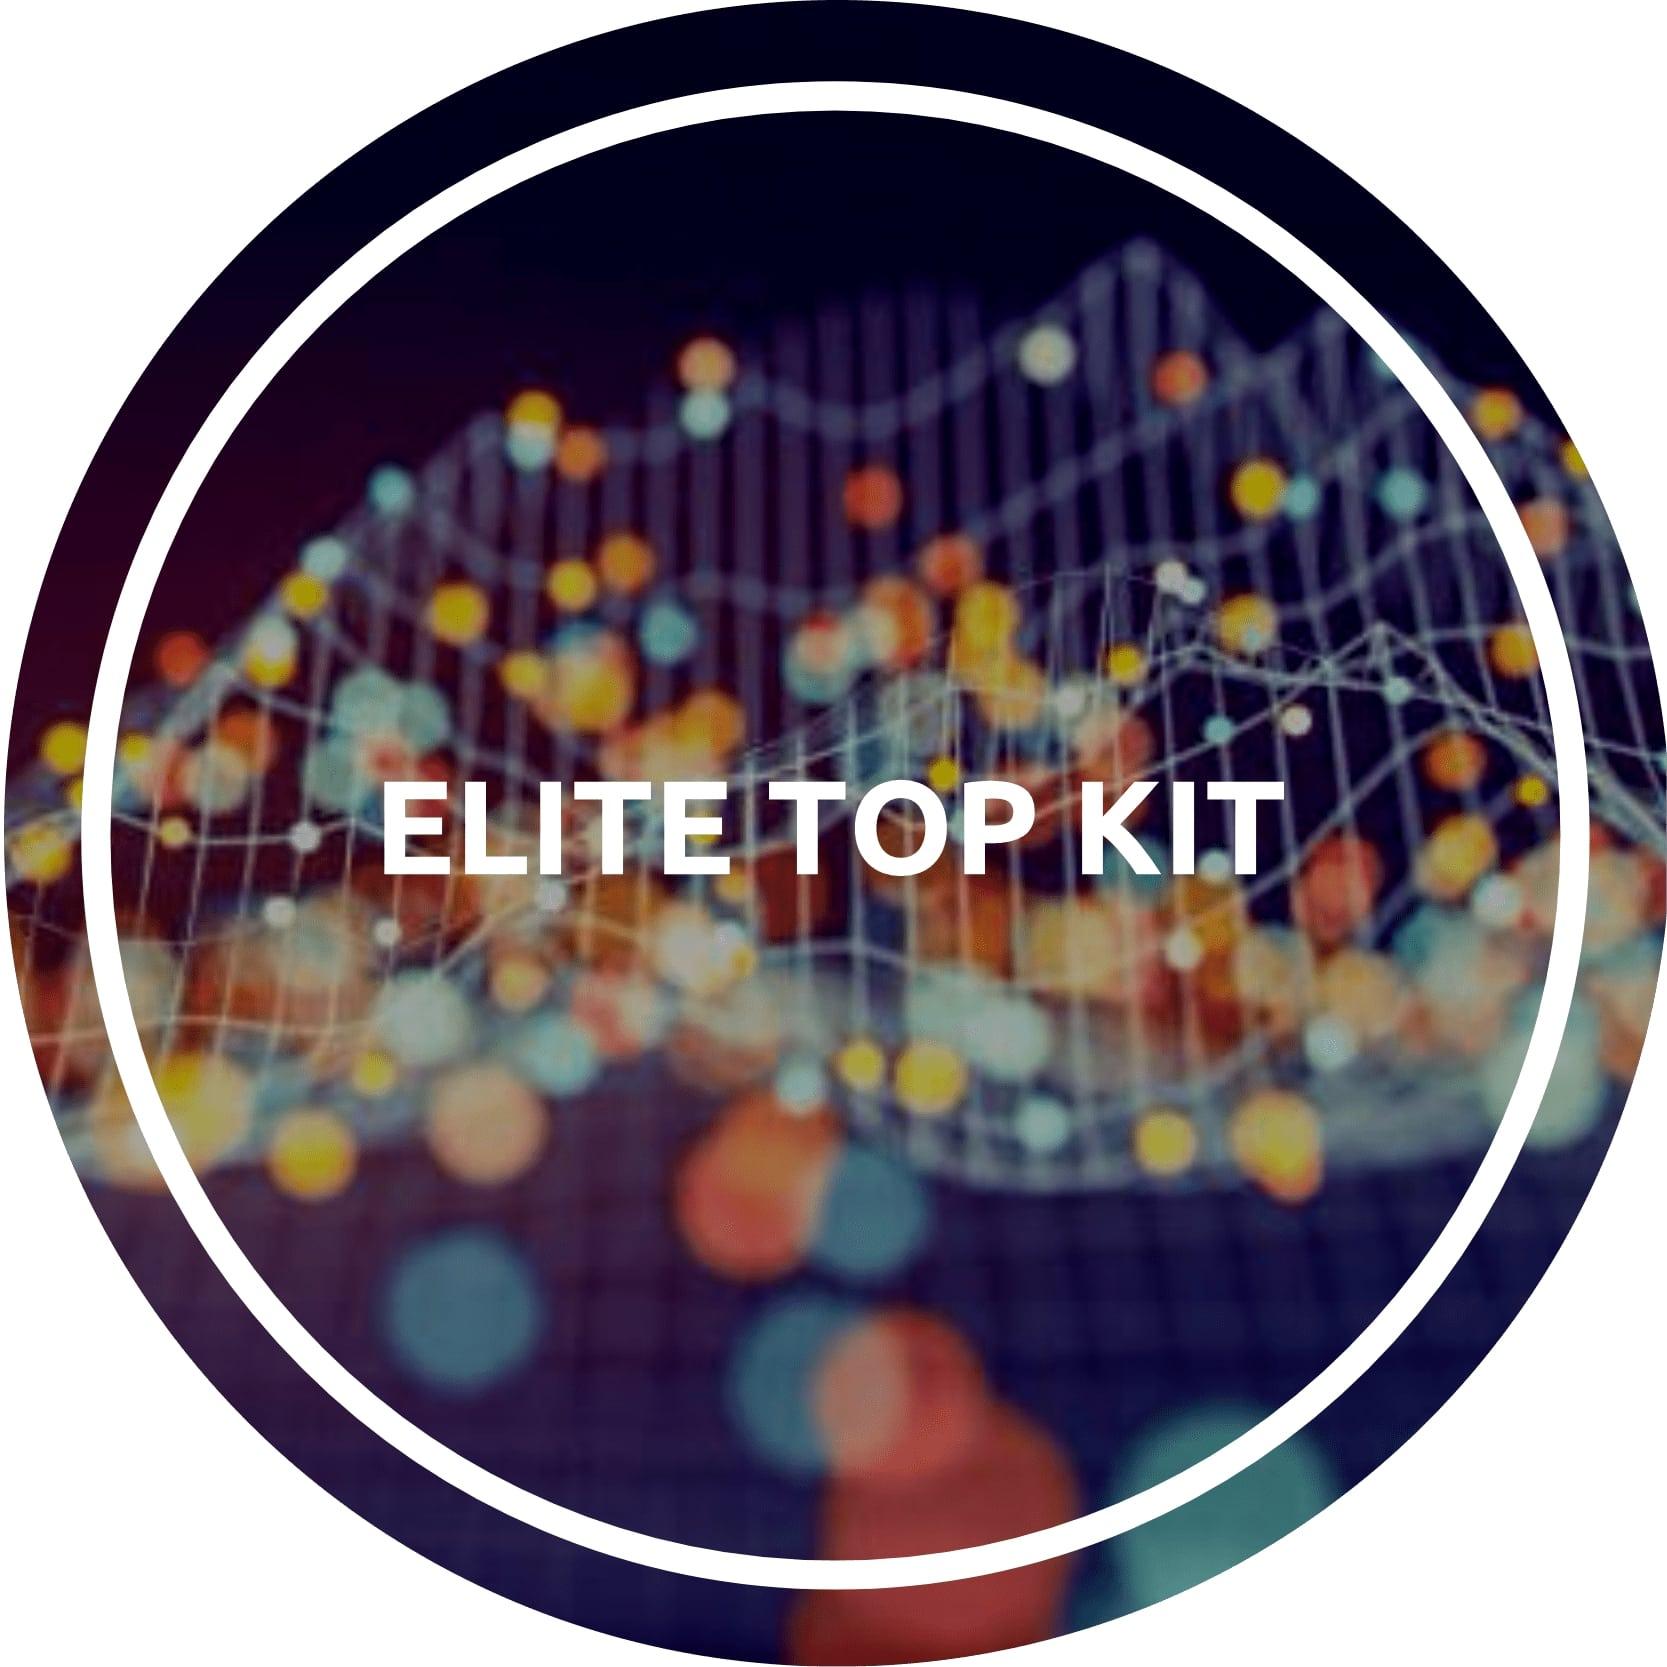 Elite Top Kit